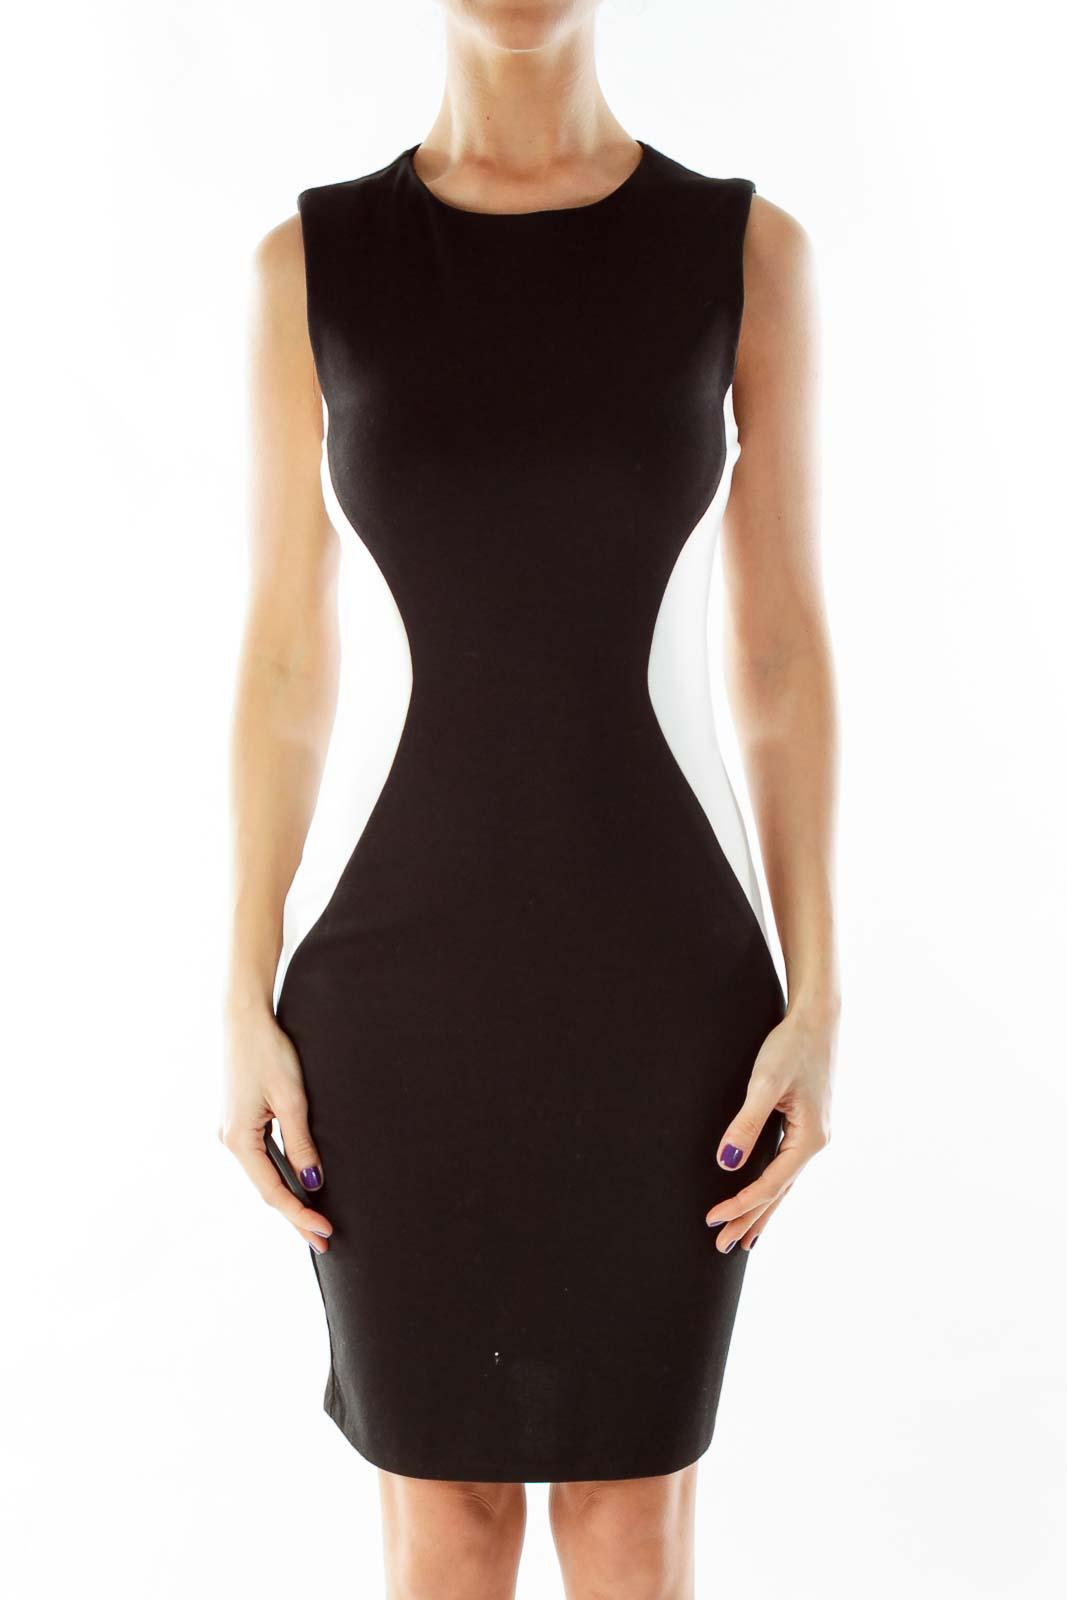 Black Cream Fitted Work Dress